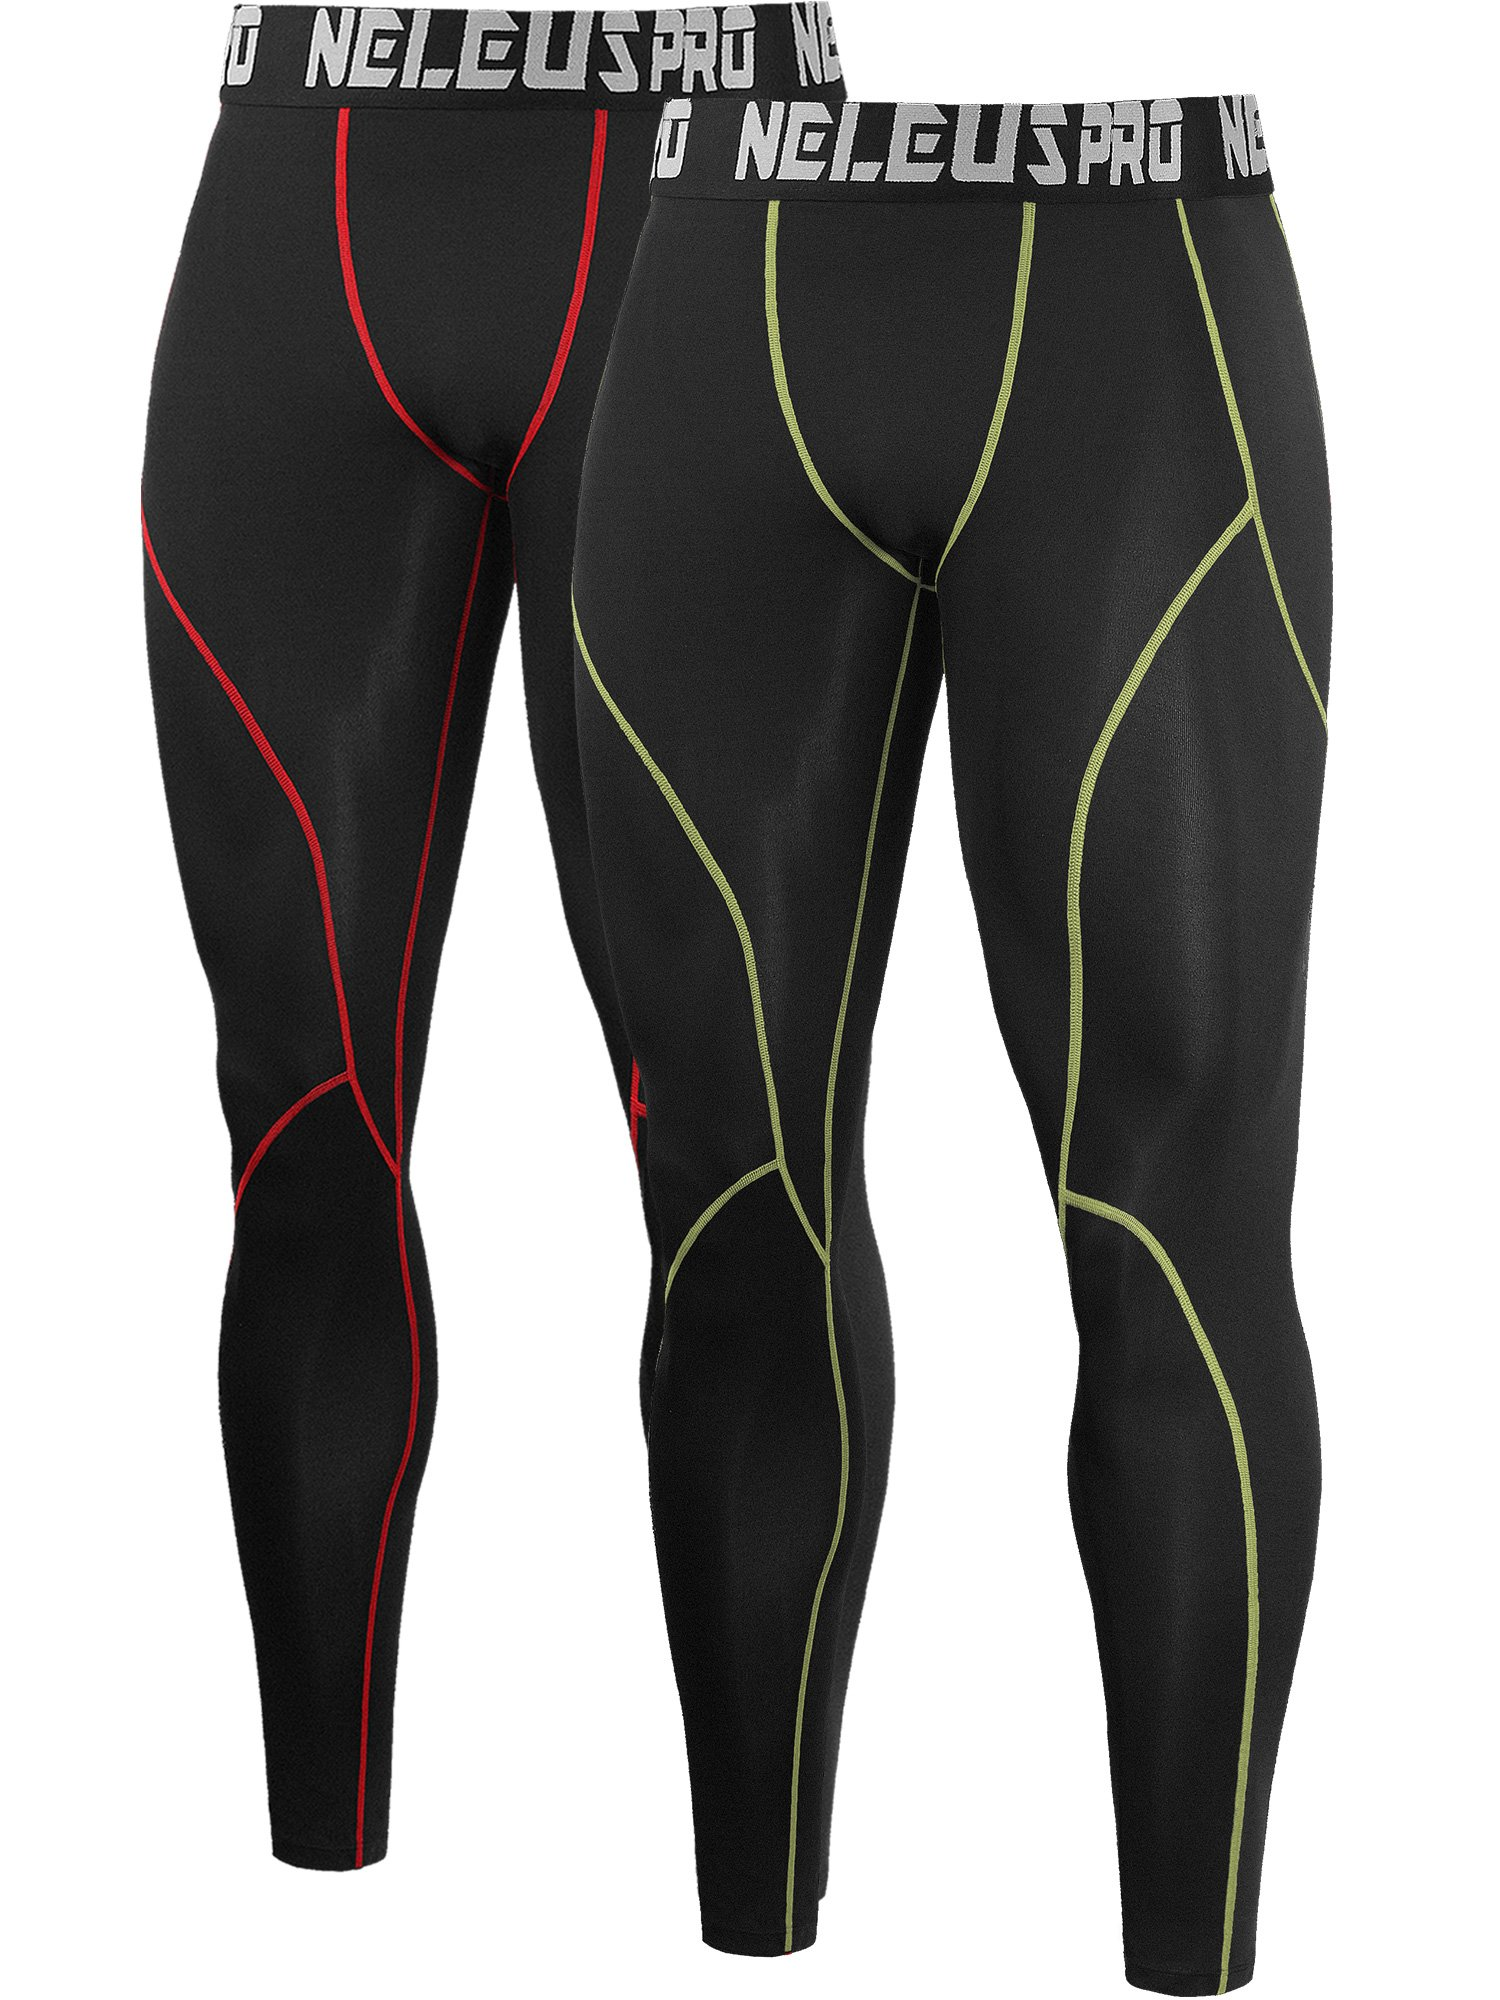 Neleus Men's 2 Pack Compression Pants Workout Running Tights Leggings,6013,Black (Red Stripe),Black (Green Stripe),US S,EU M